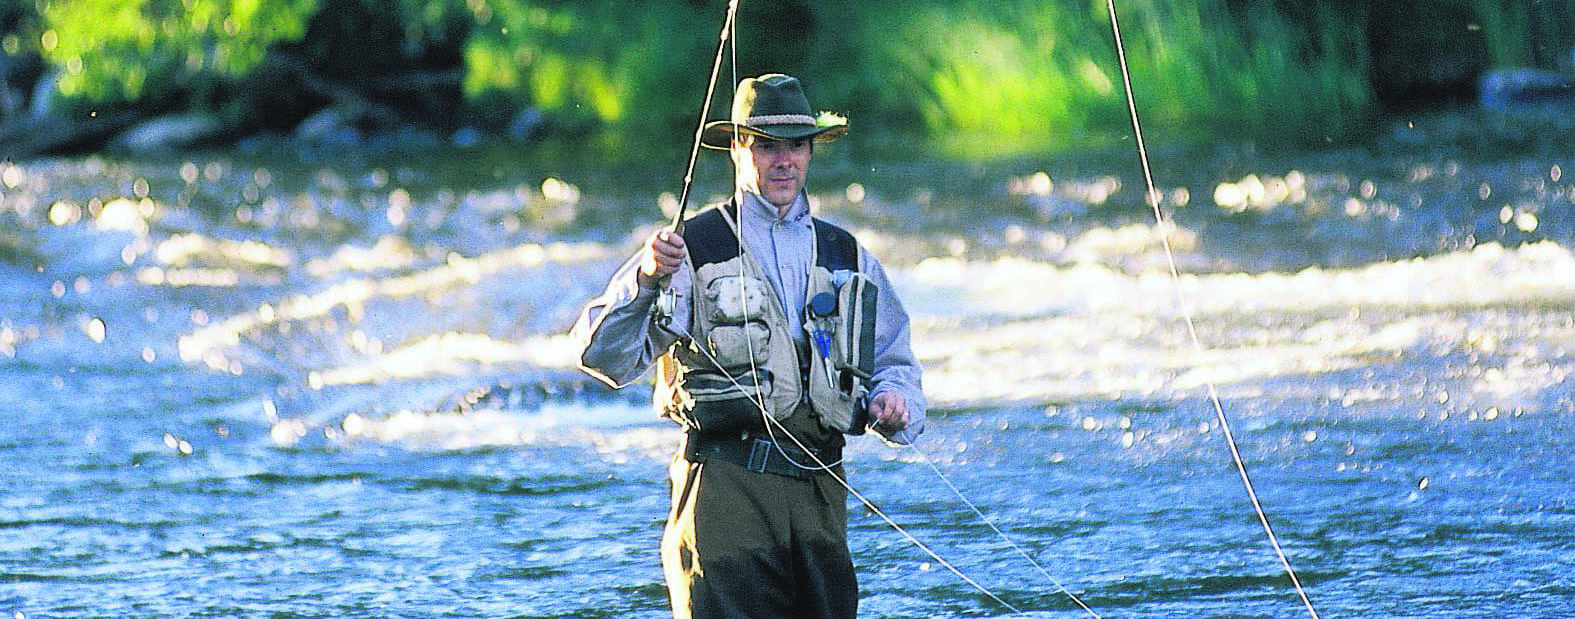 FishMagnet_Fishing_Kuopio_-Finland_.jpg